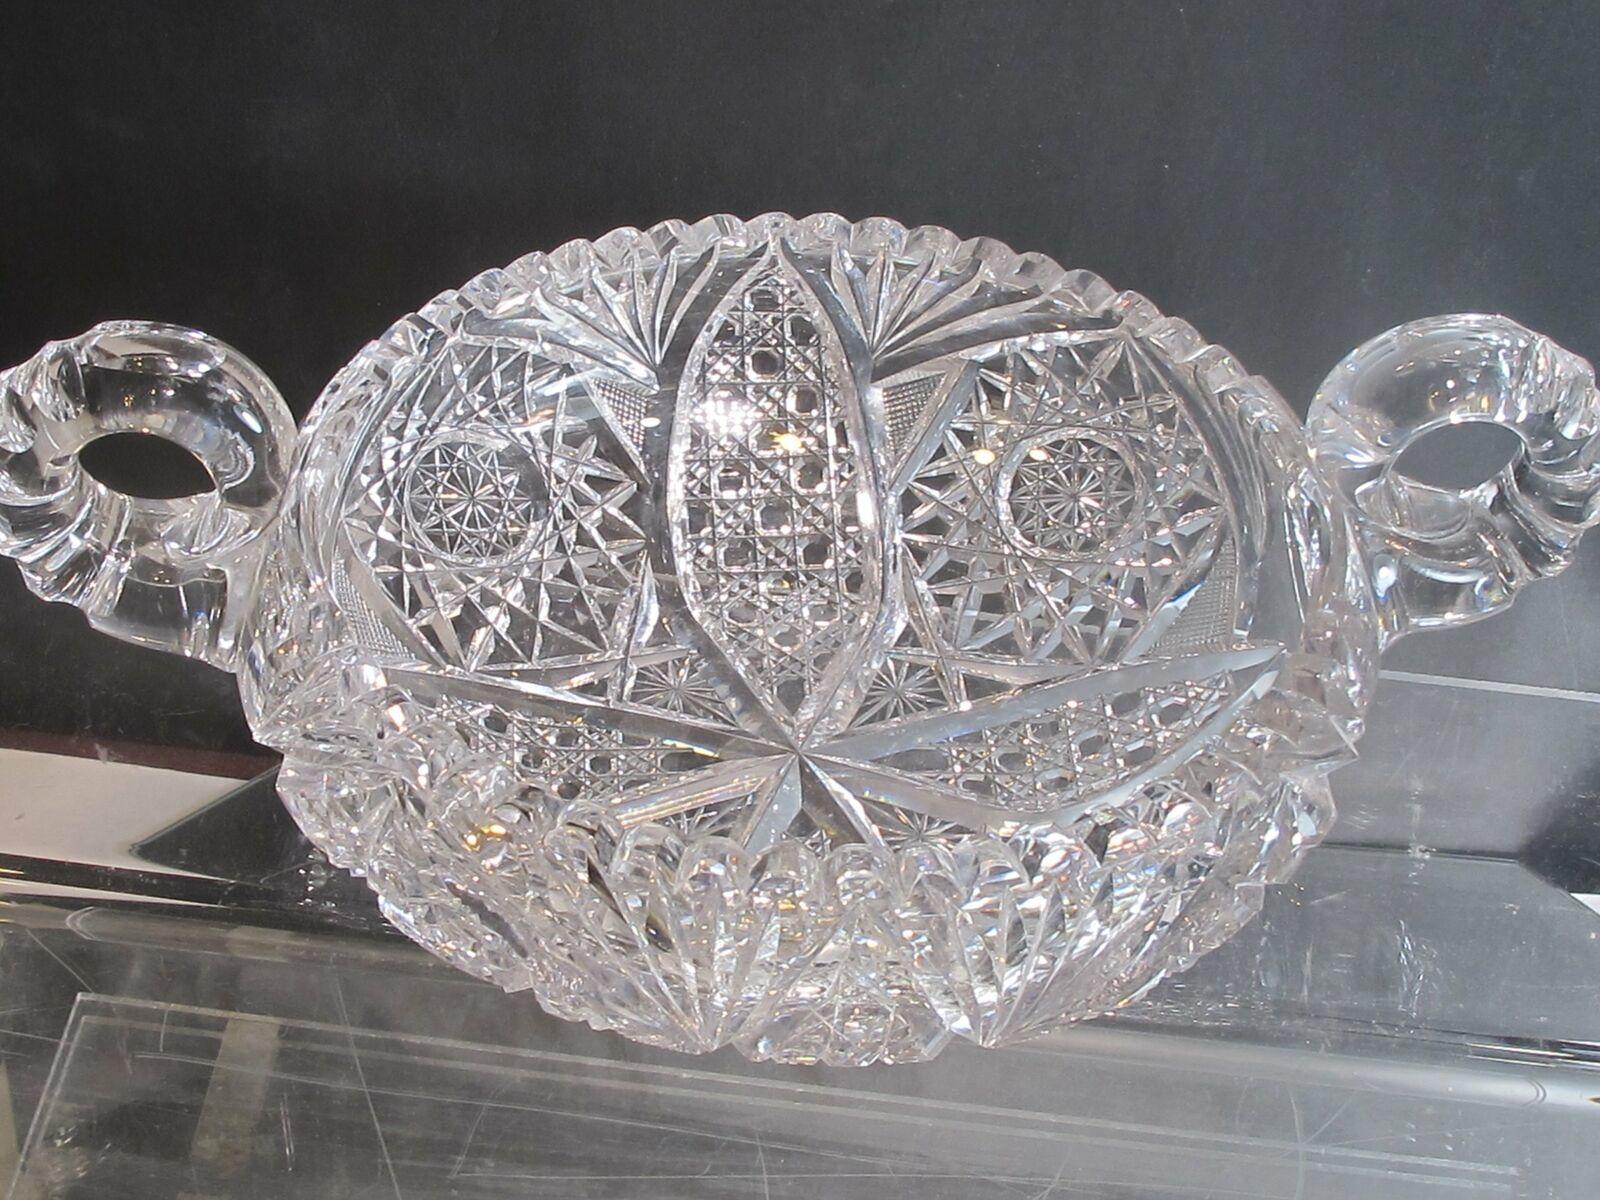 Hand Cut Glass 2 handled bowl abp - $196.00